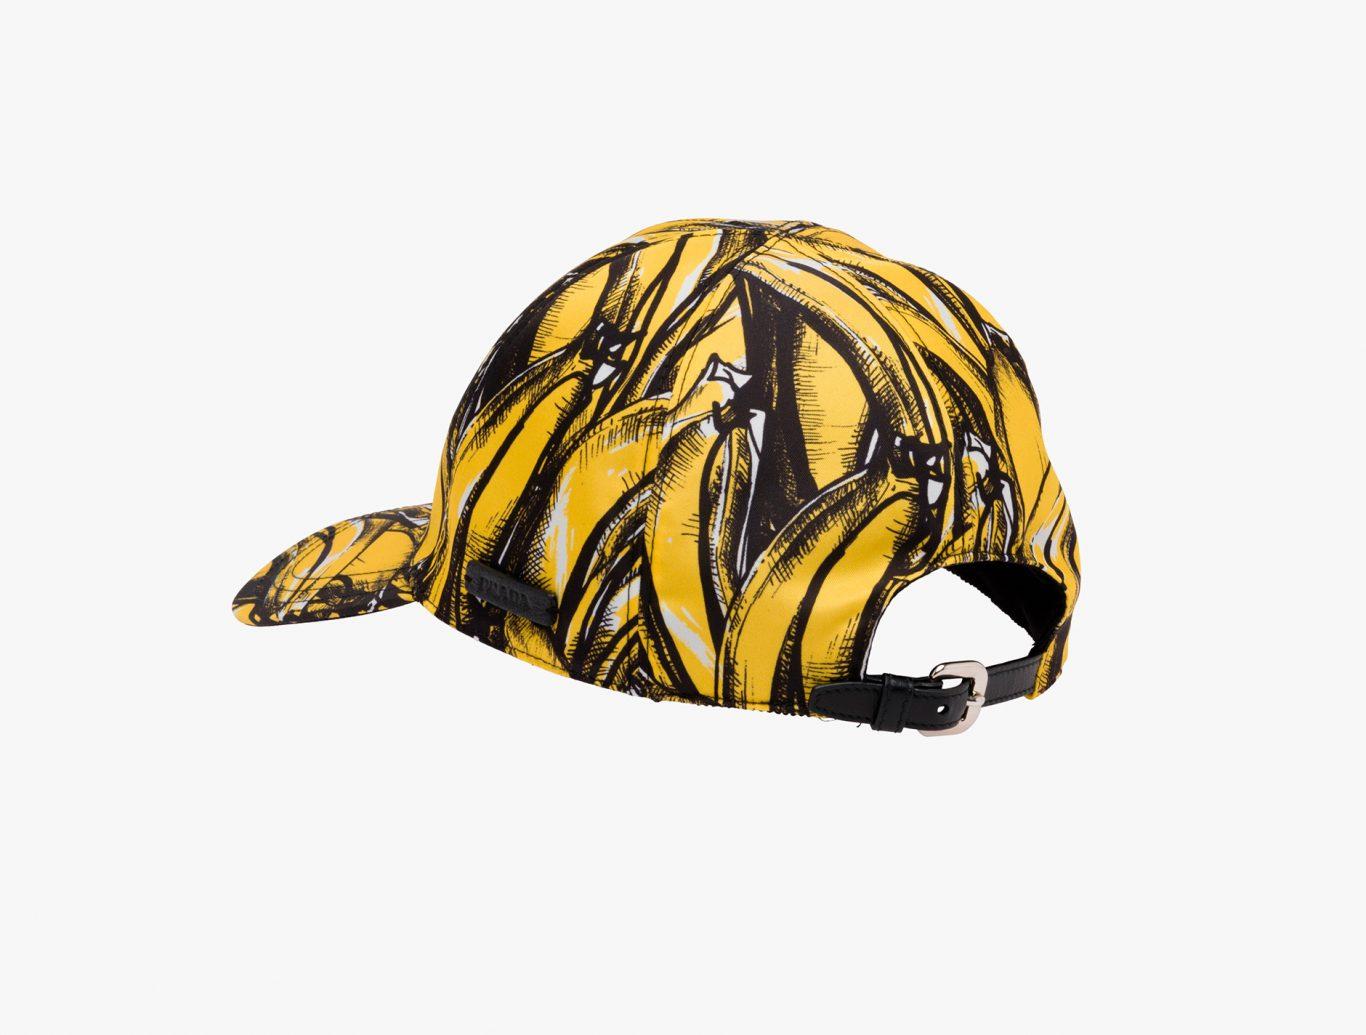 gorra-de-beisbol-de-nylon-estampada-de-Prada-230-euros